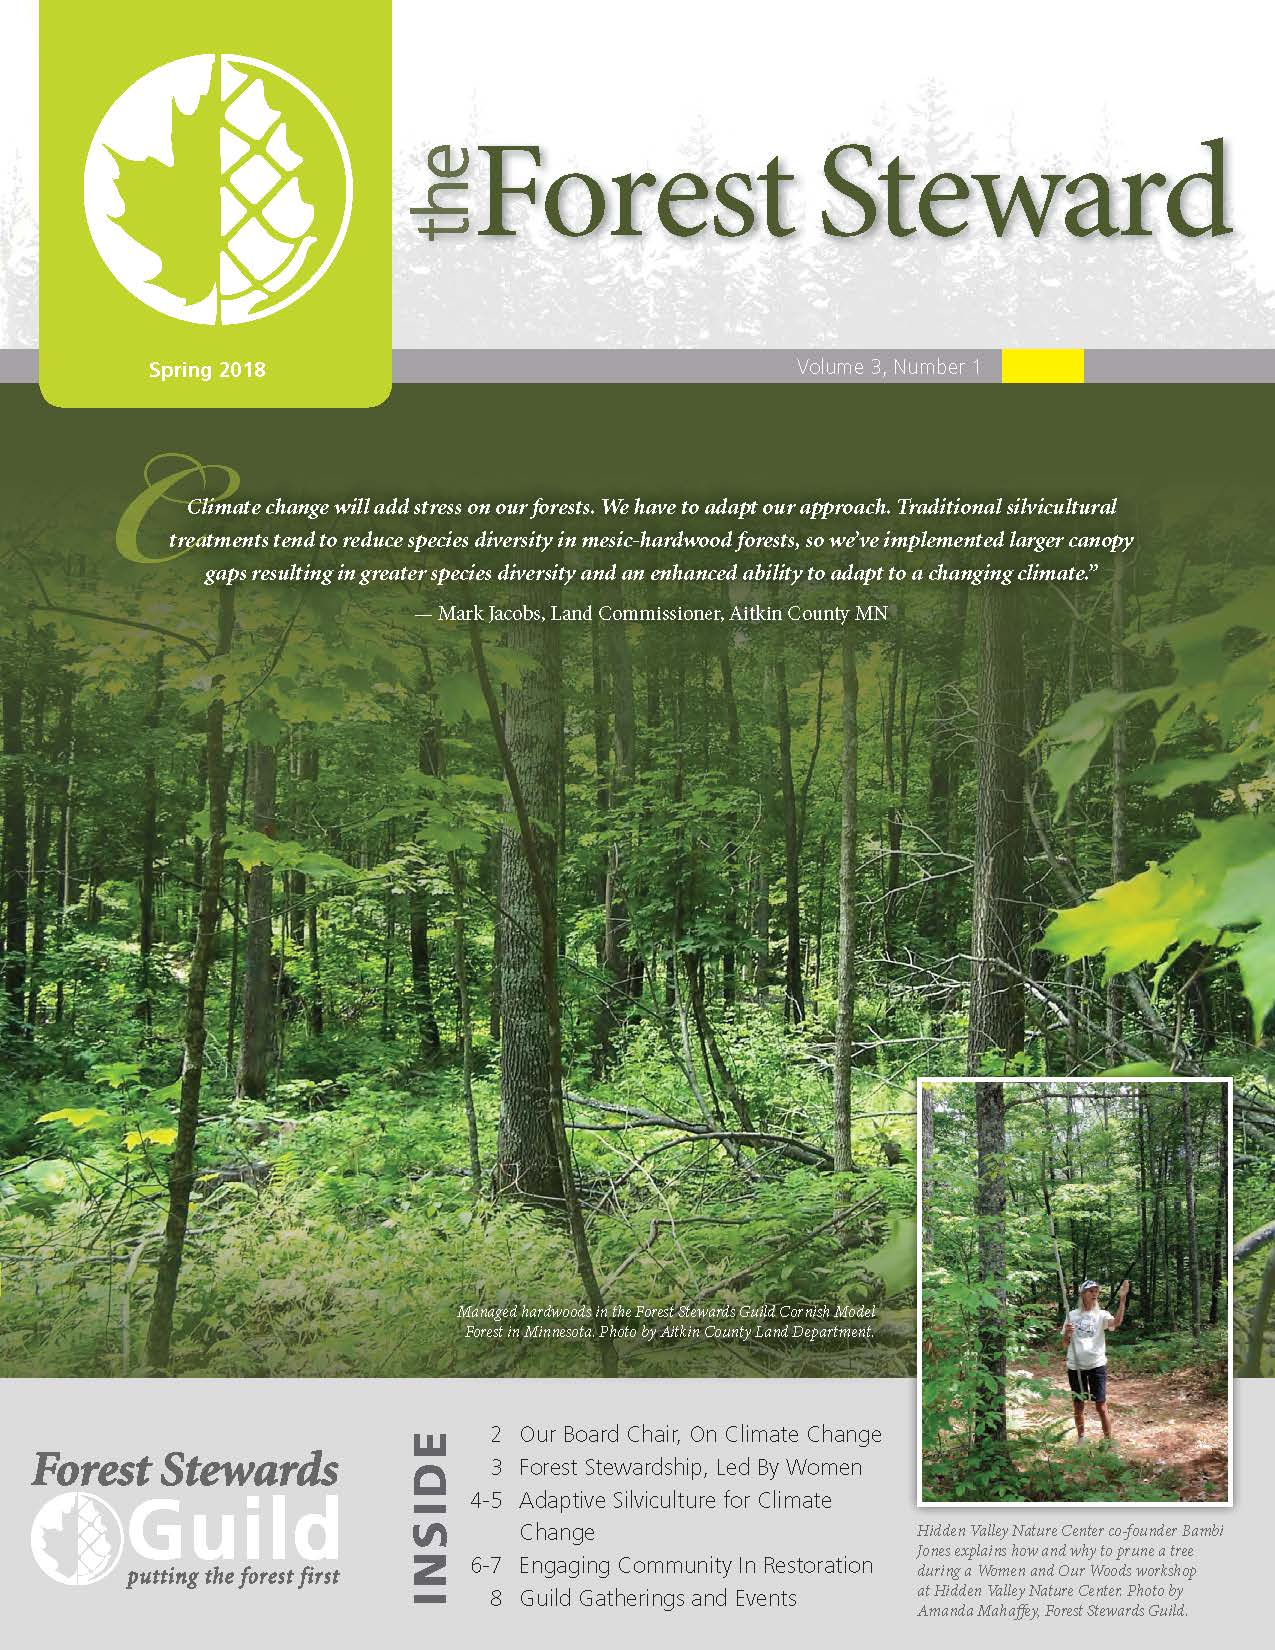 FSG_ForestSteward_Vol3No1_image